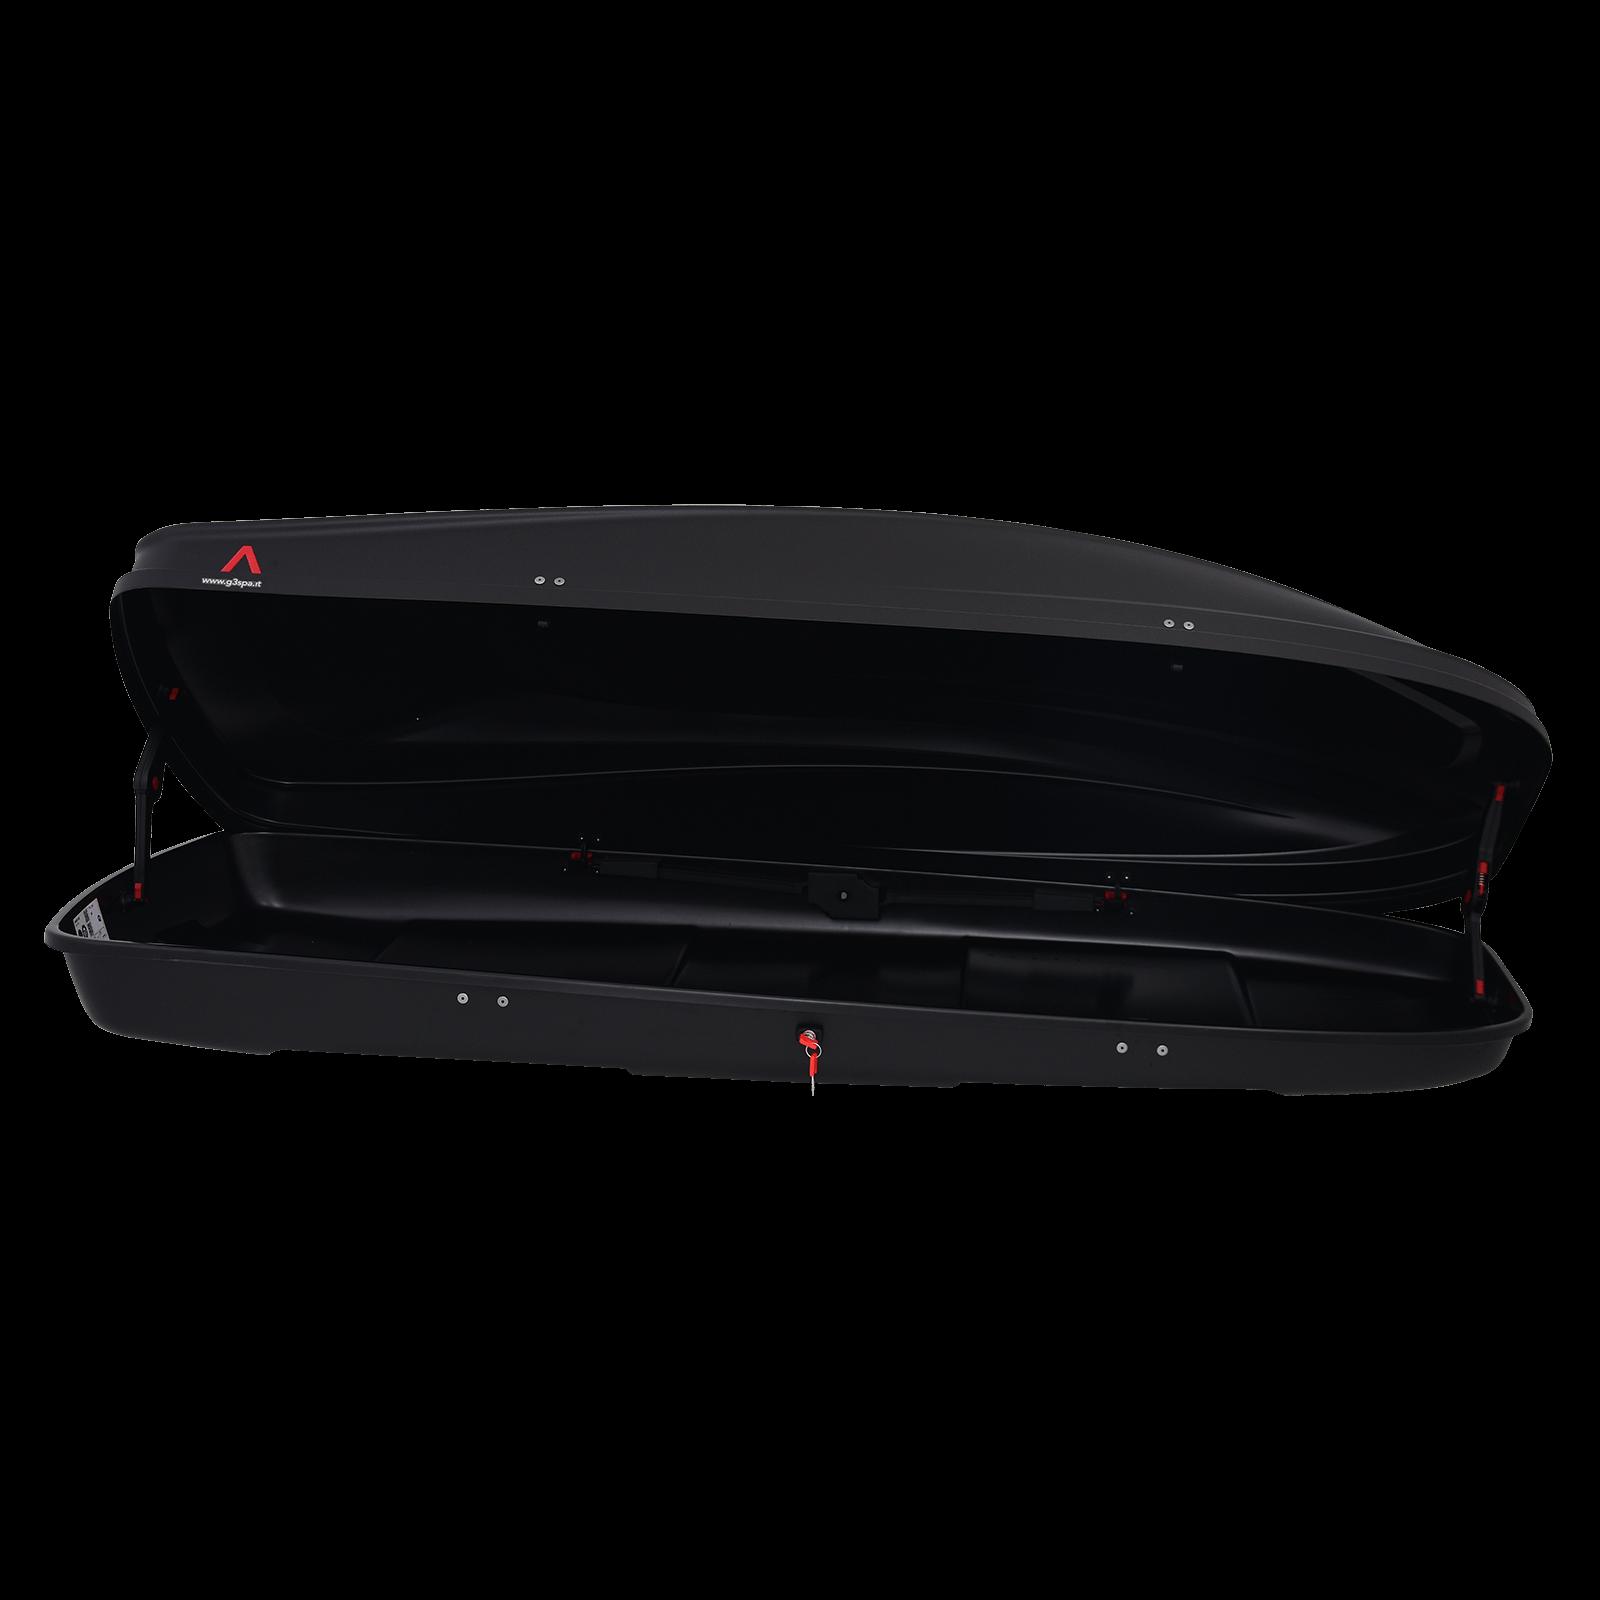 Dachbox G3 Spark 480 schwarz matt - Bild 2